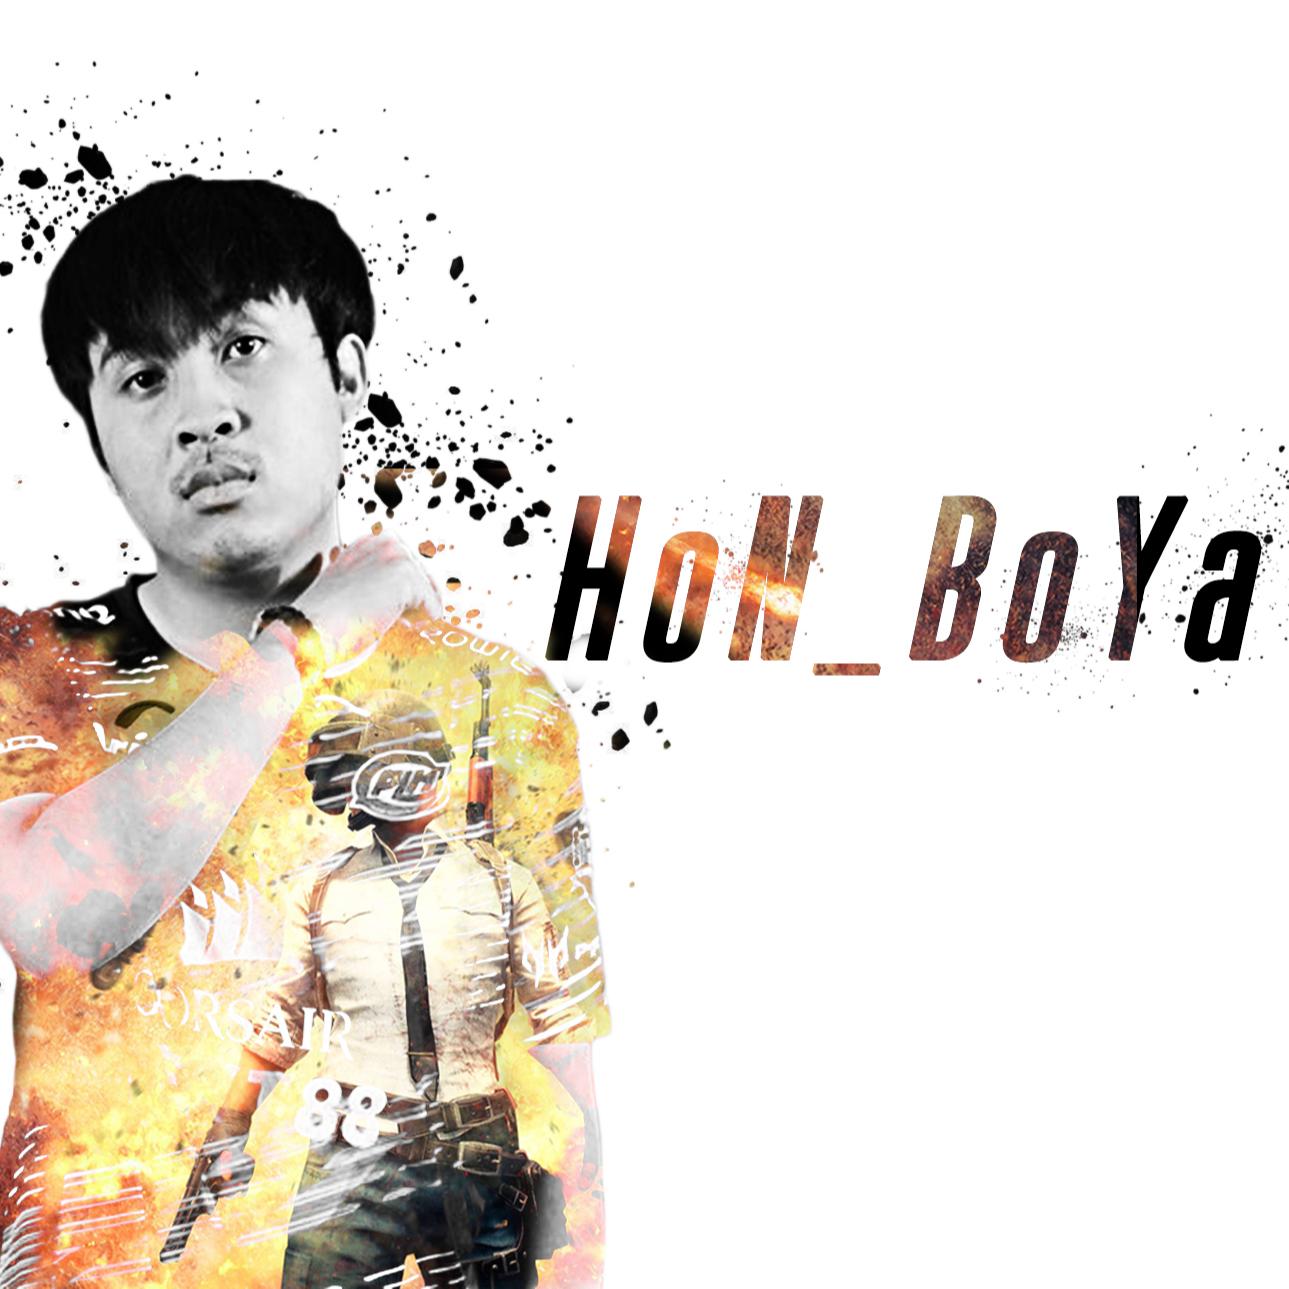 HoN_BoYa